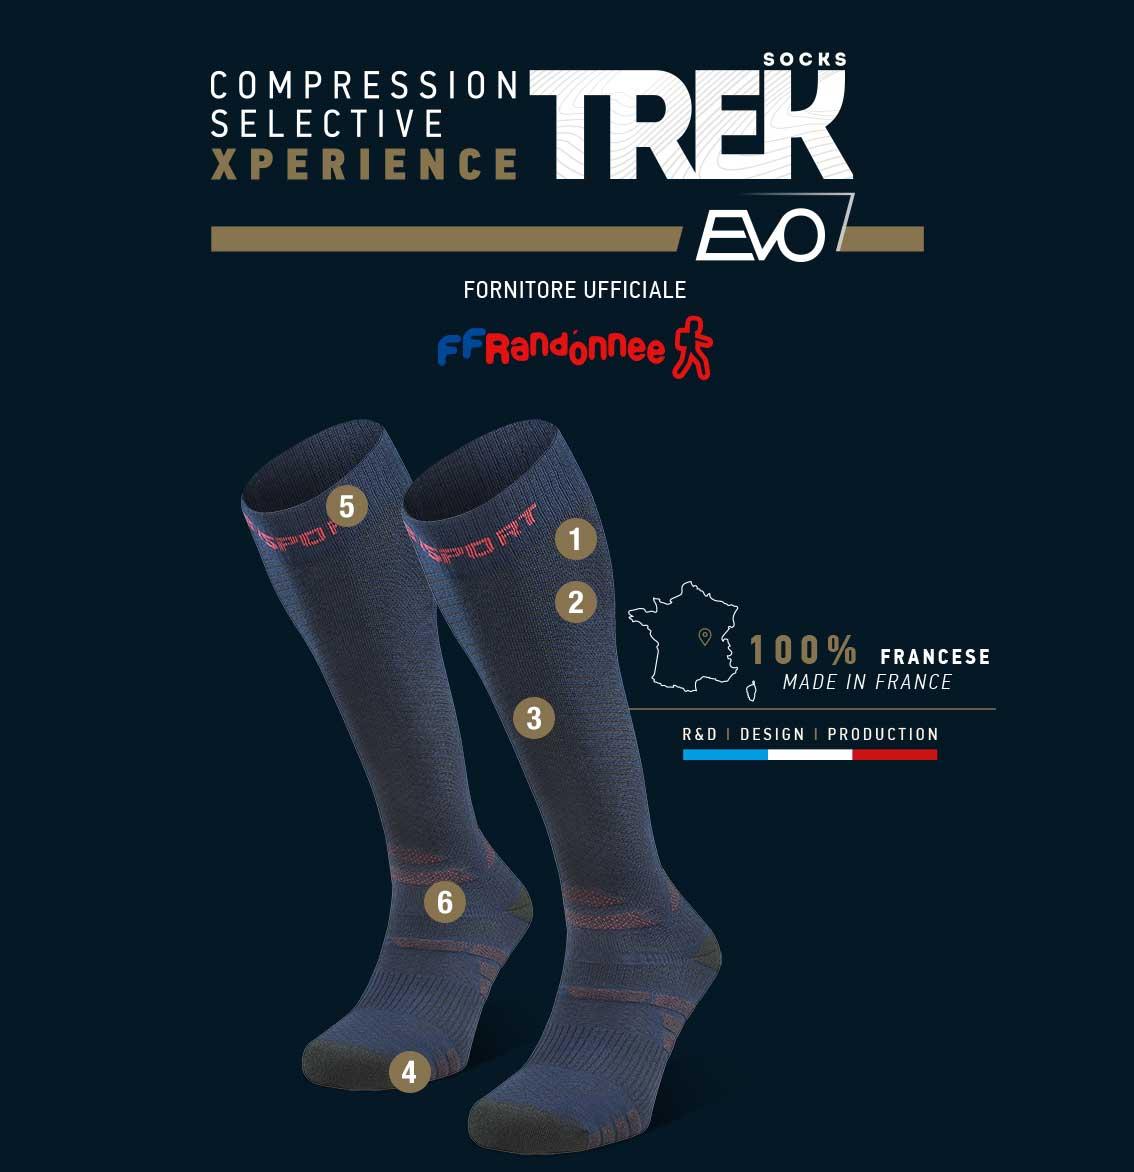 Calza_da_trekking_Trek_compression_EVO_blu-rosso